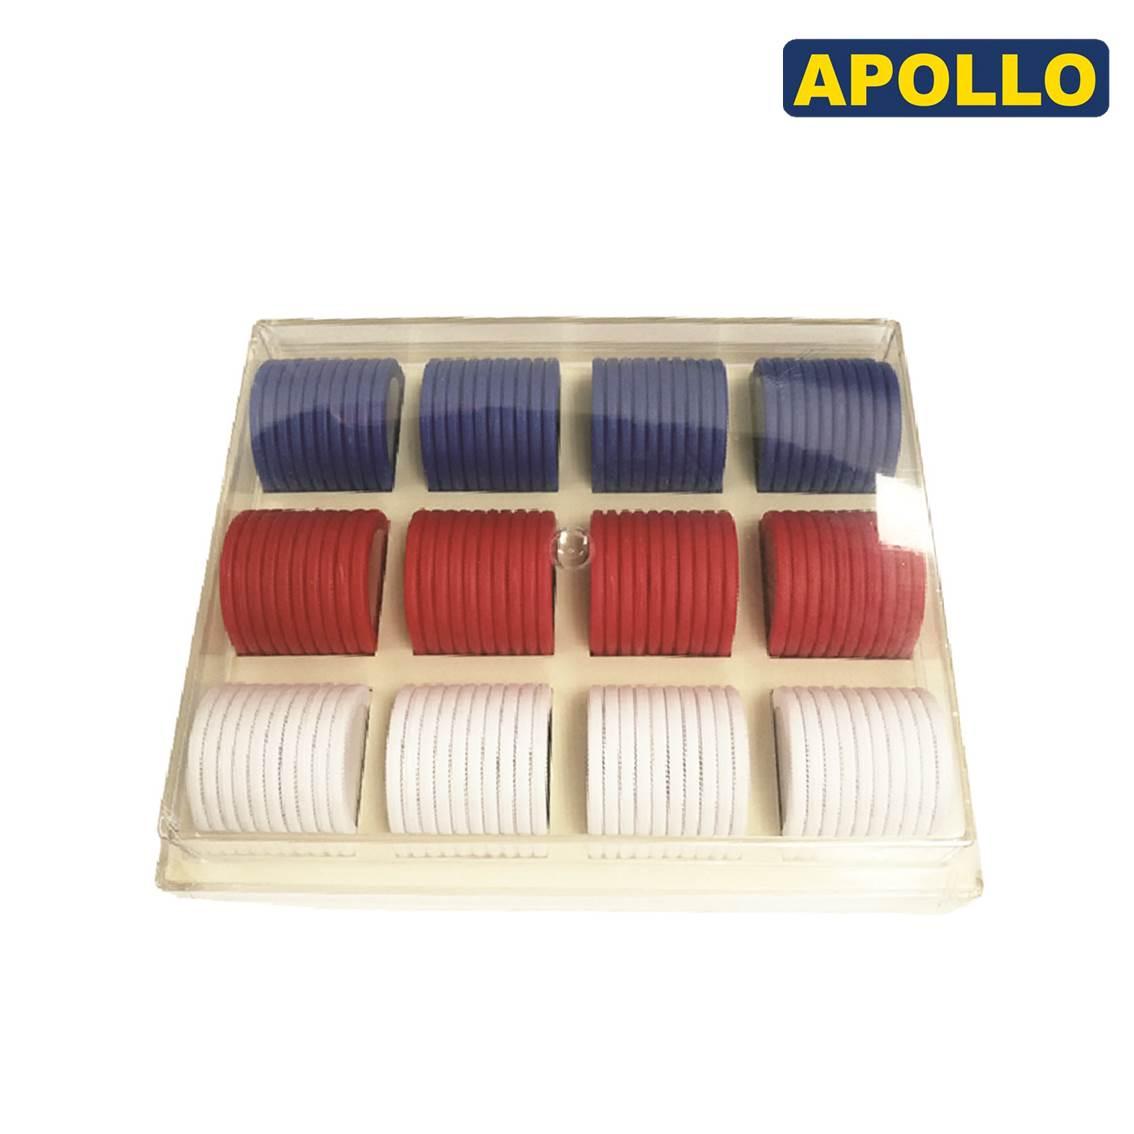 Apollo經典籌碼(3色)